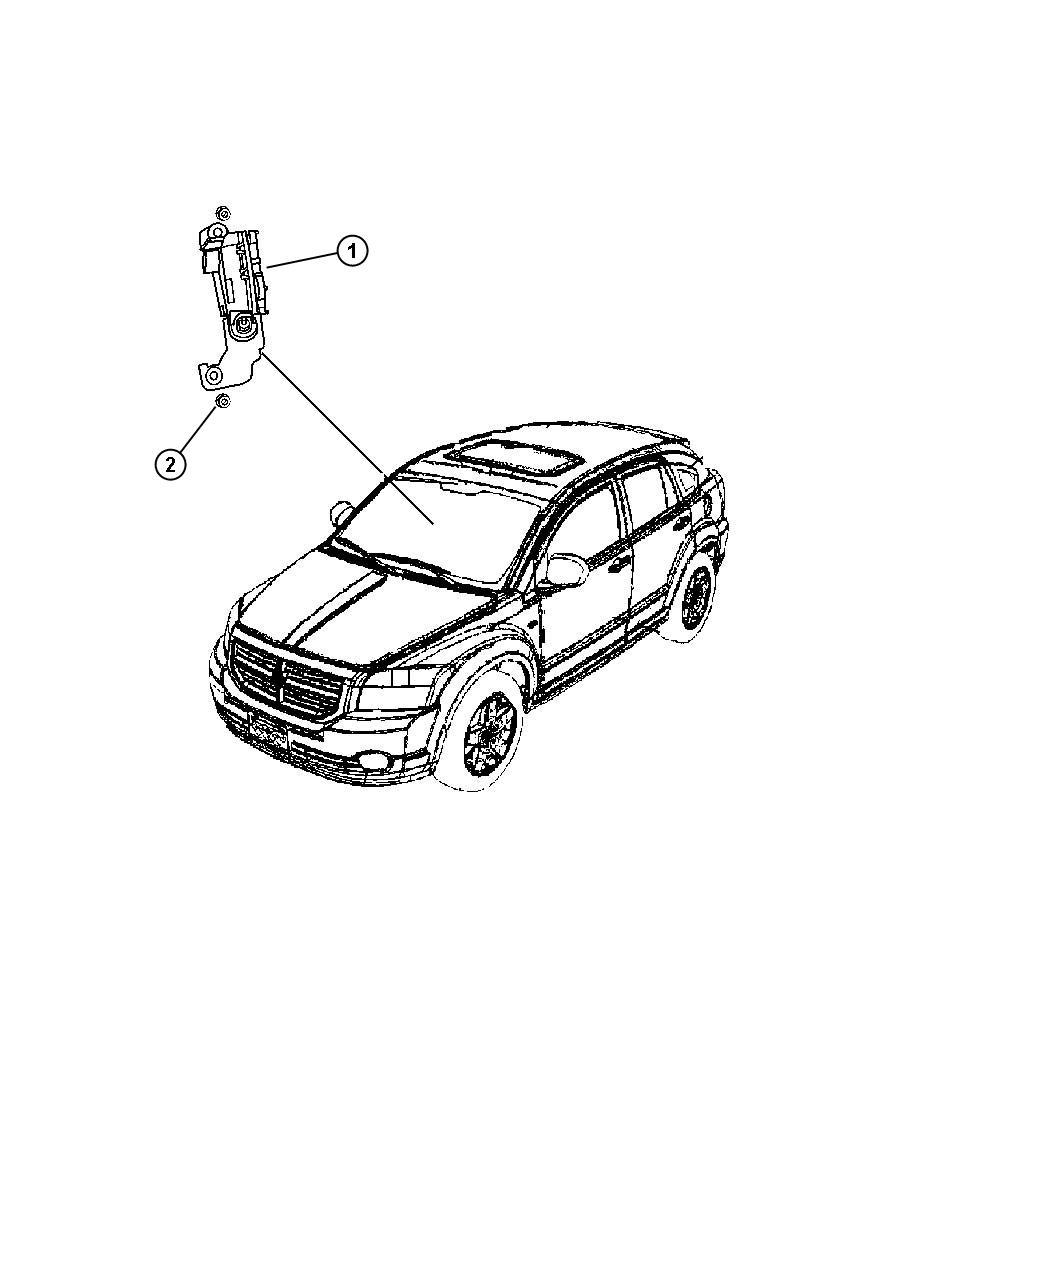 2008 Jeep Patriot Parts Diagram | Wiring Diagram Database